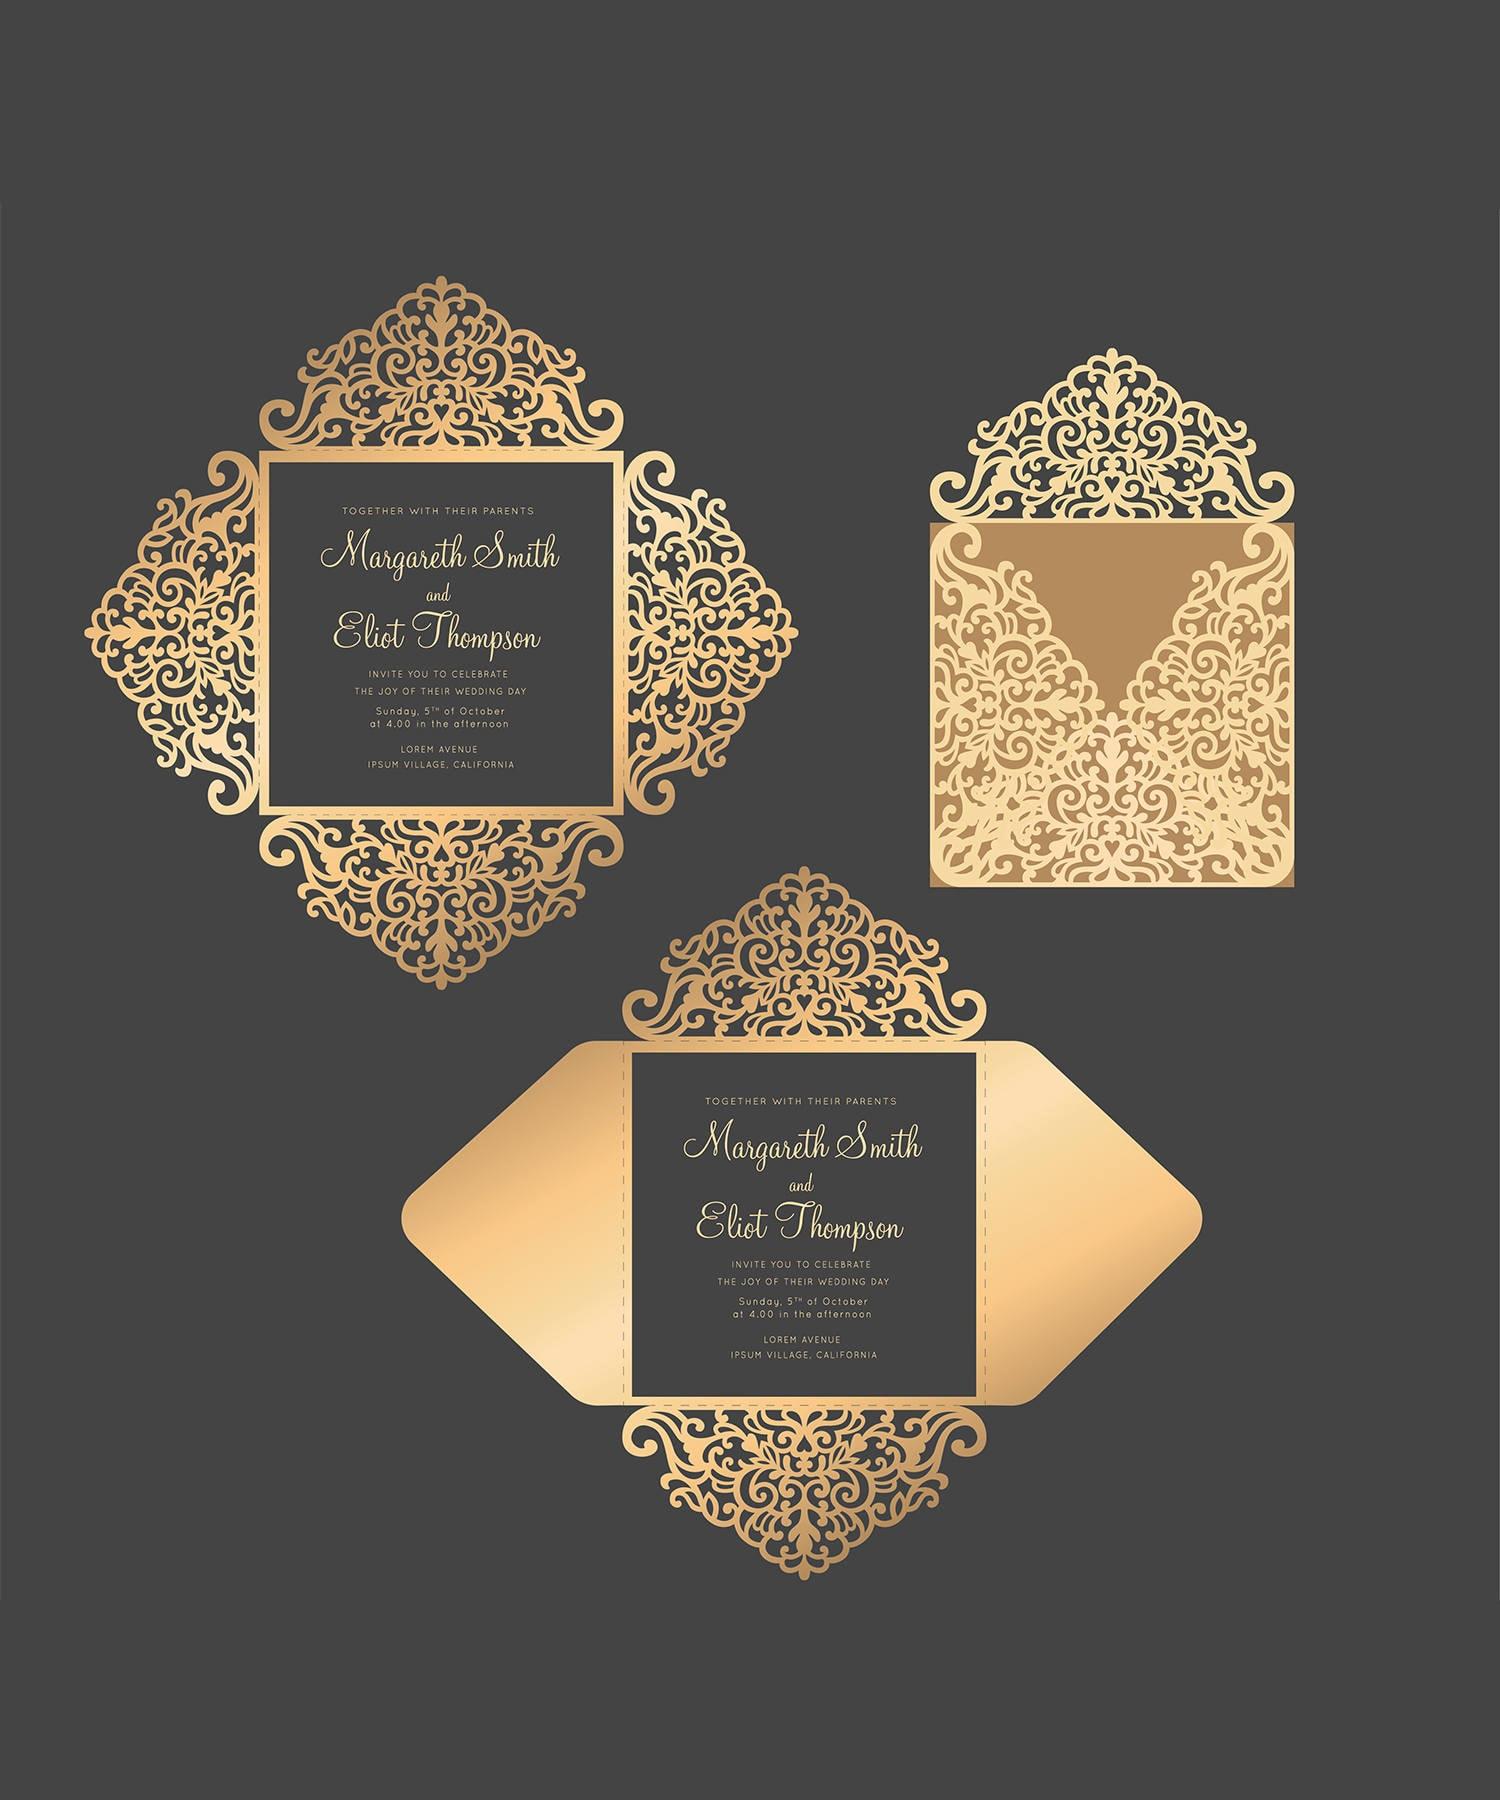 Wedding Invitation Envelopes Canada: Laser Cut Wedding Invitation Four-fold Envelope SVG